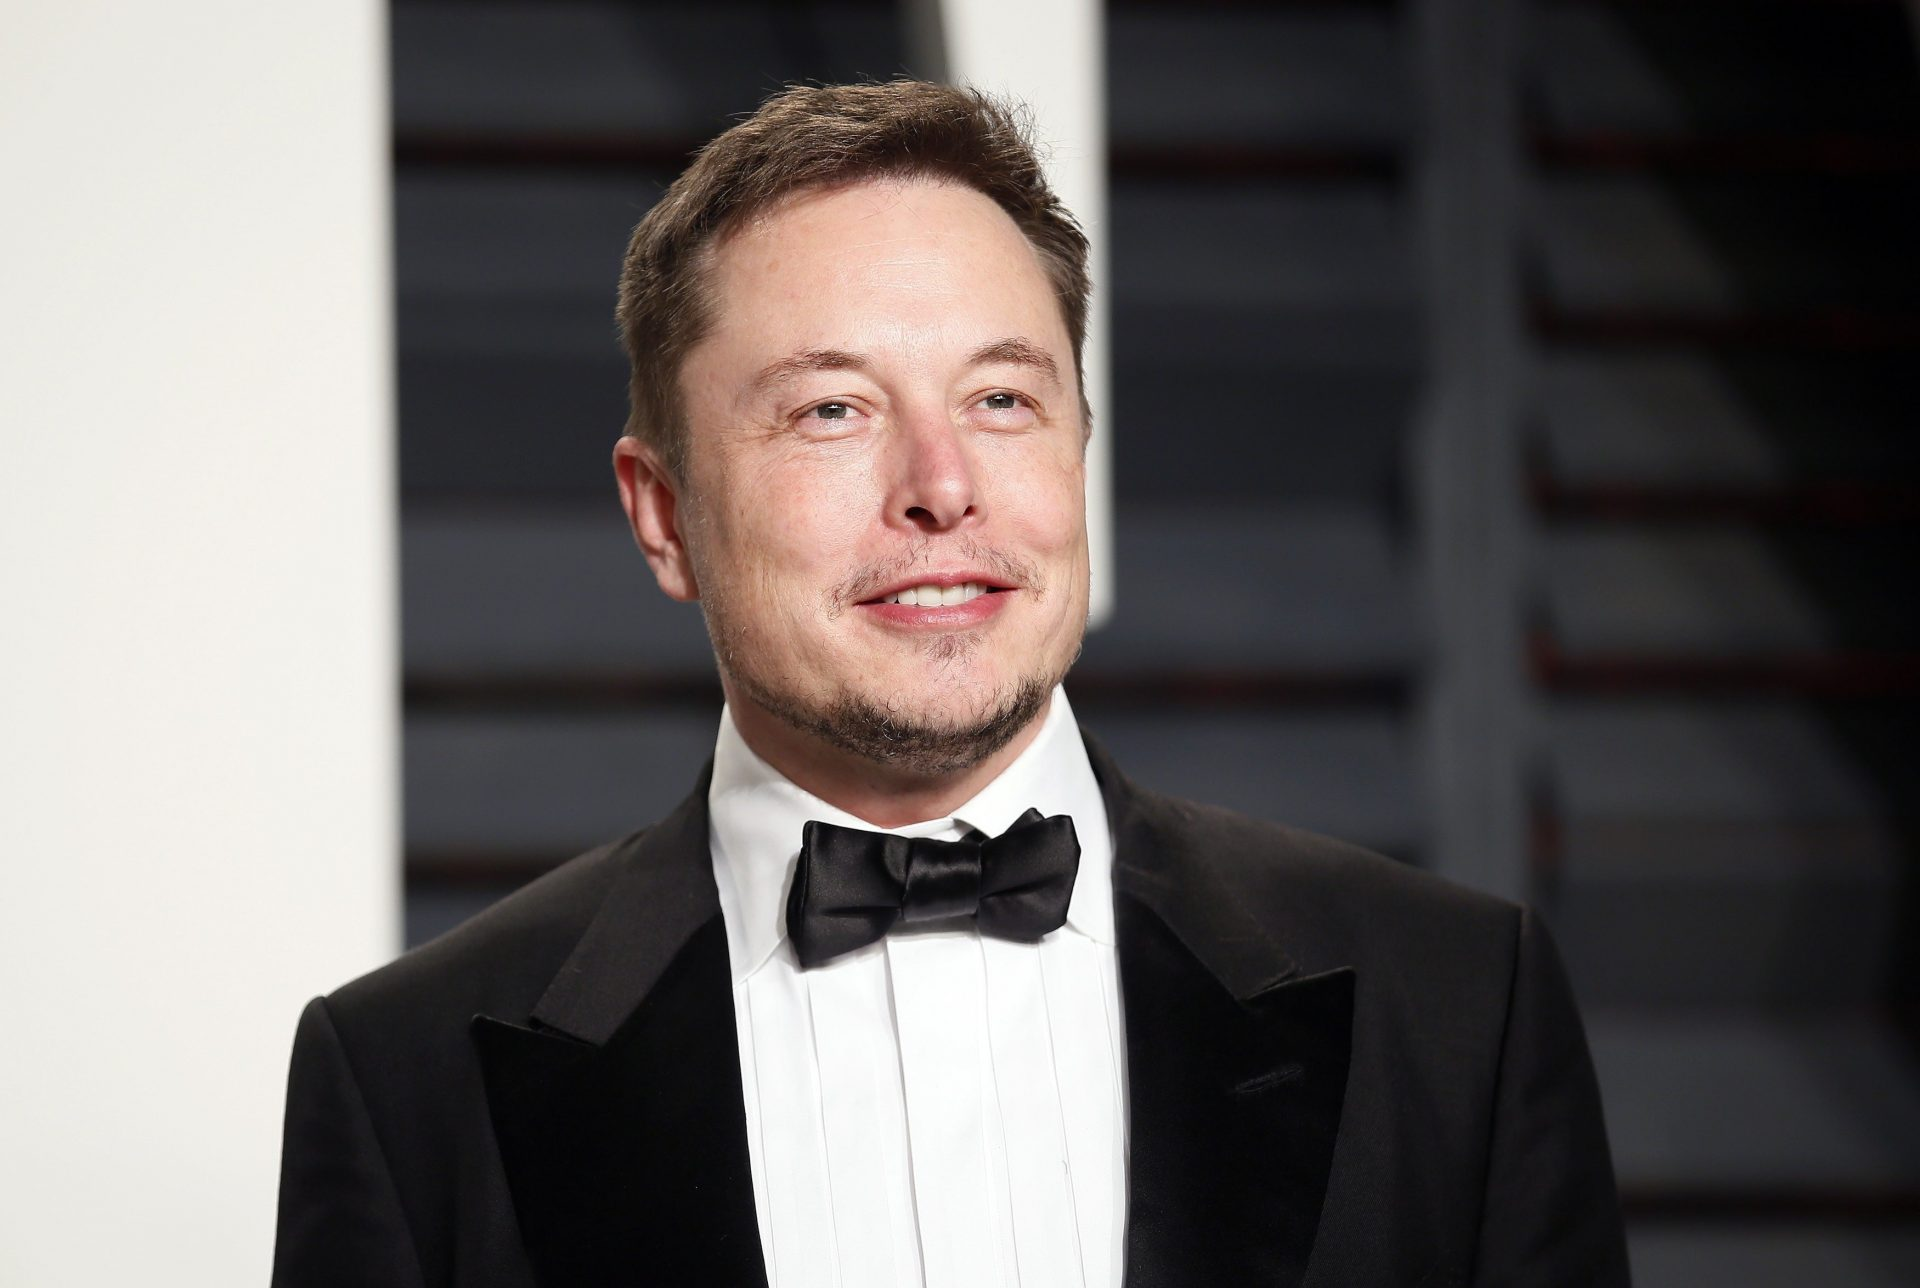 Editiadedimineata: Elon Musk a devenit al patrulea cel mai bogat om al lumii